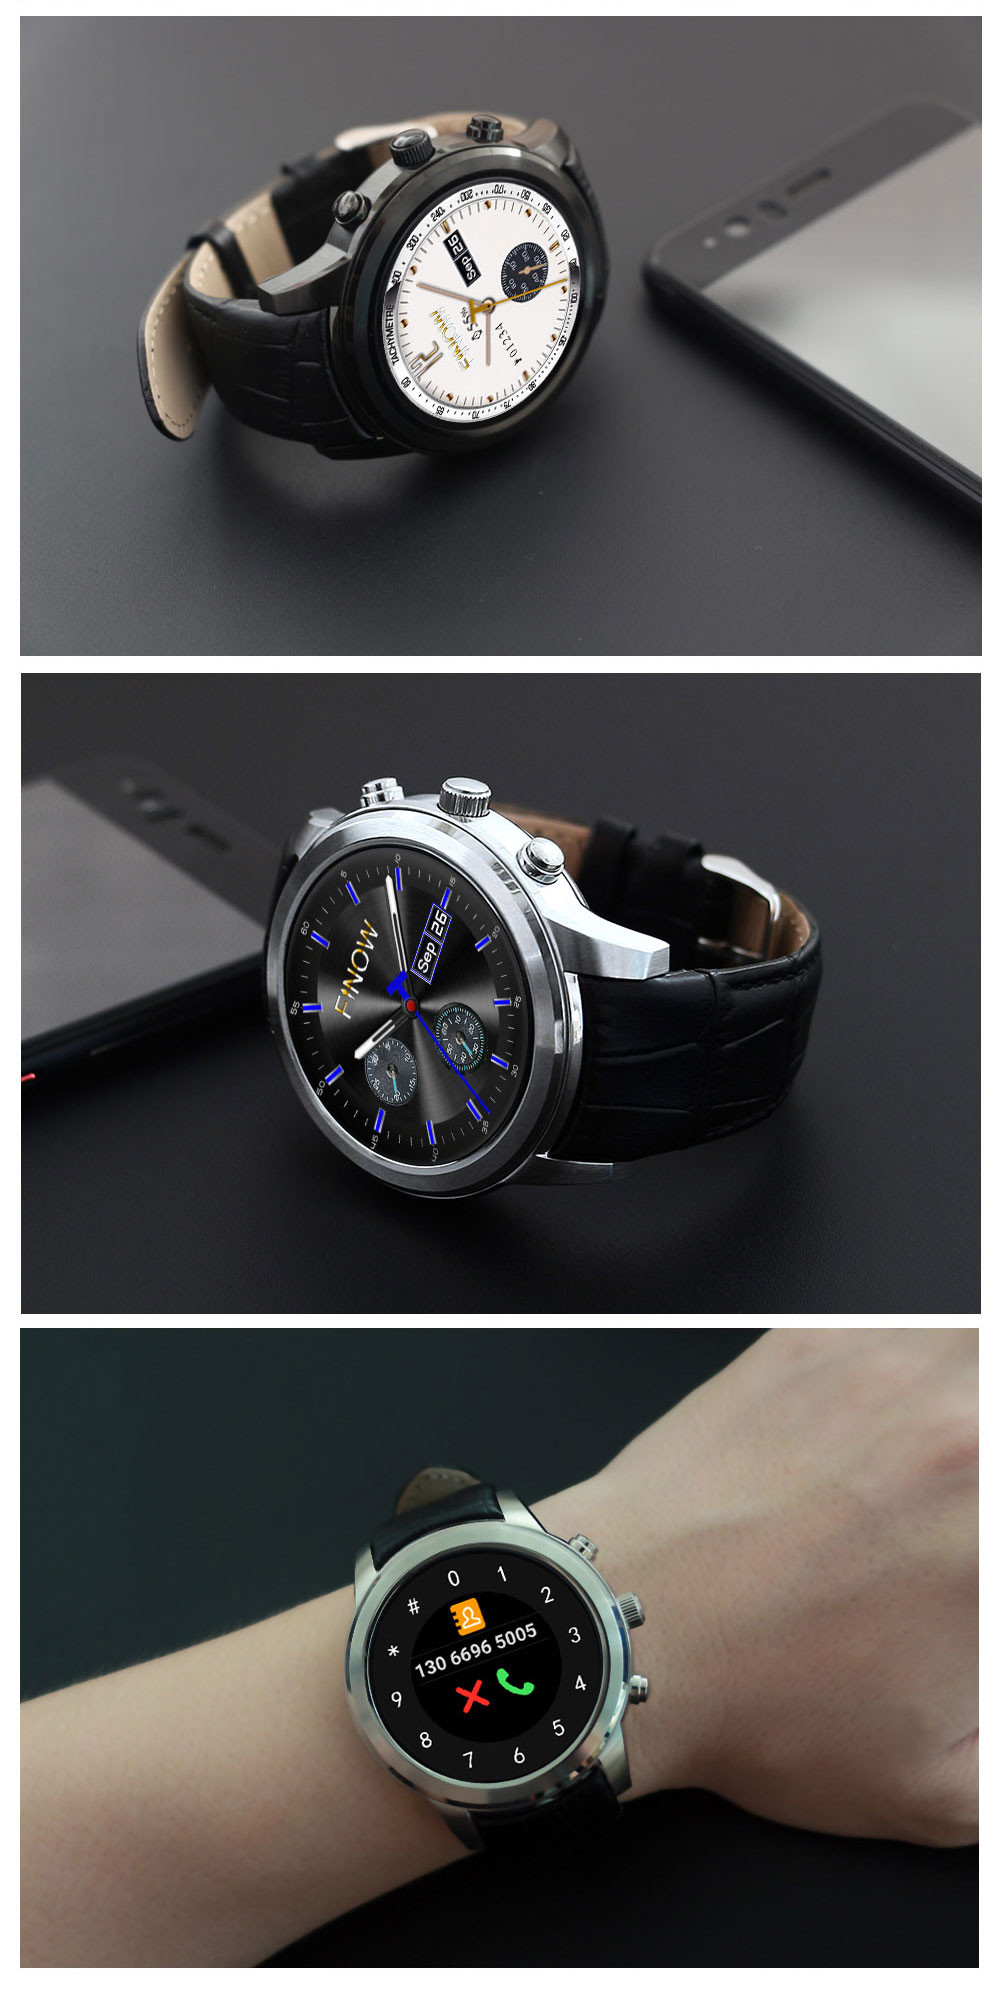 finow x5 air smart watch13